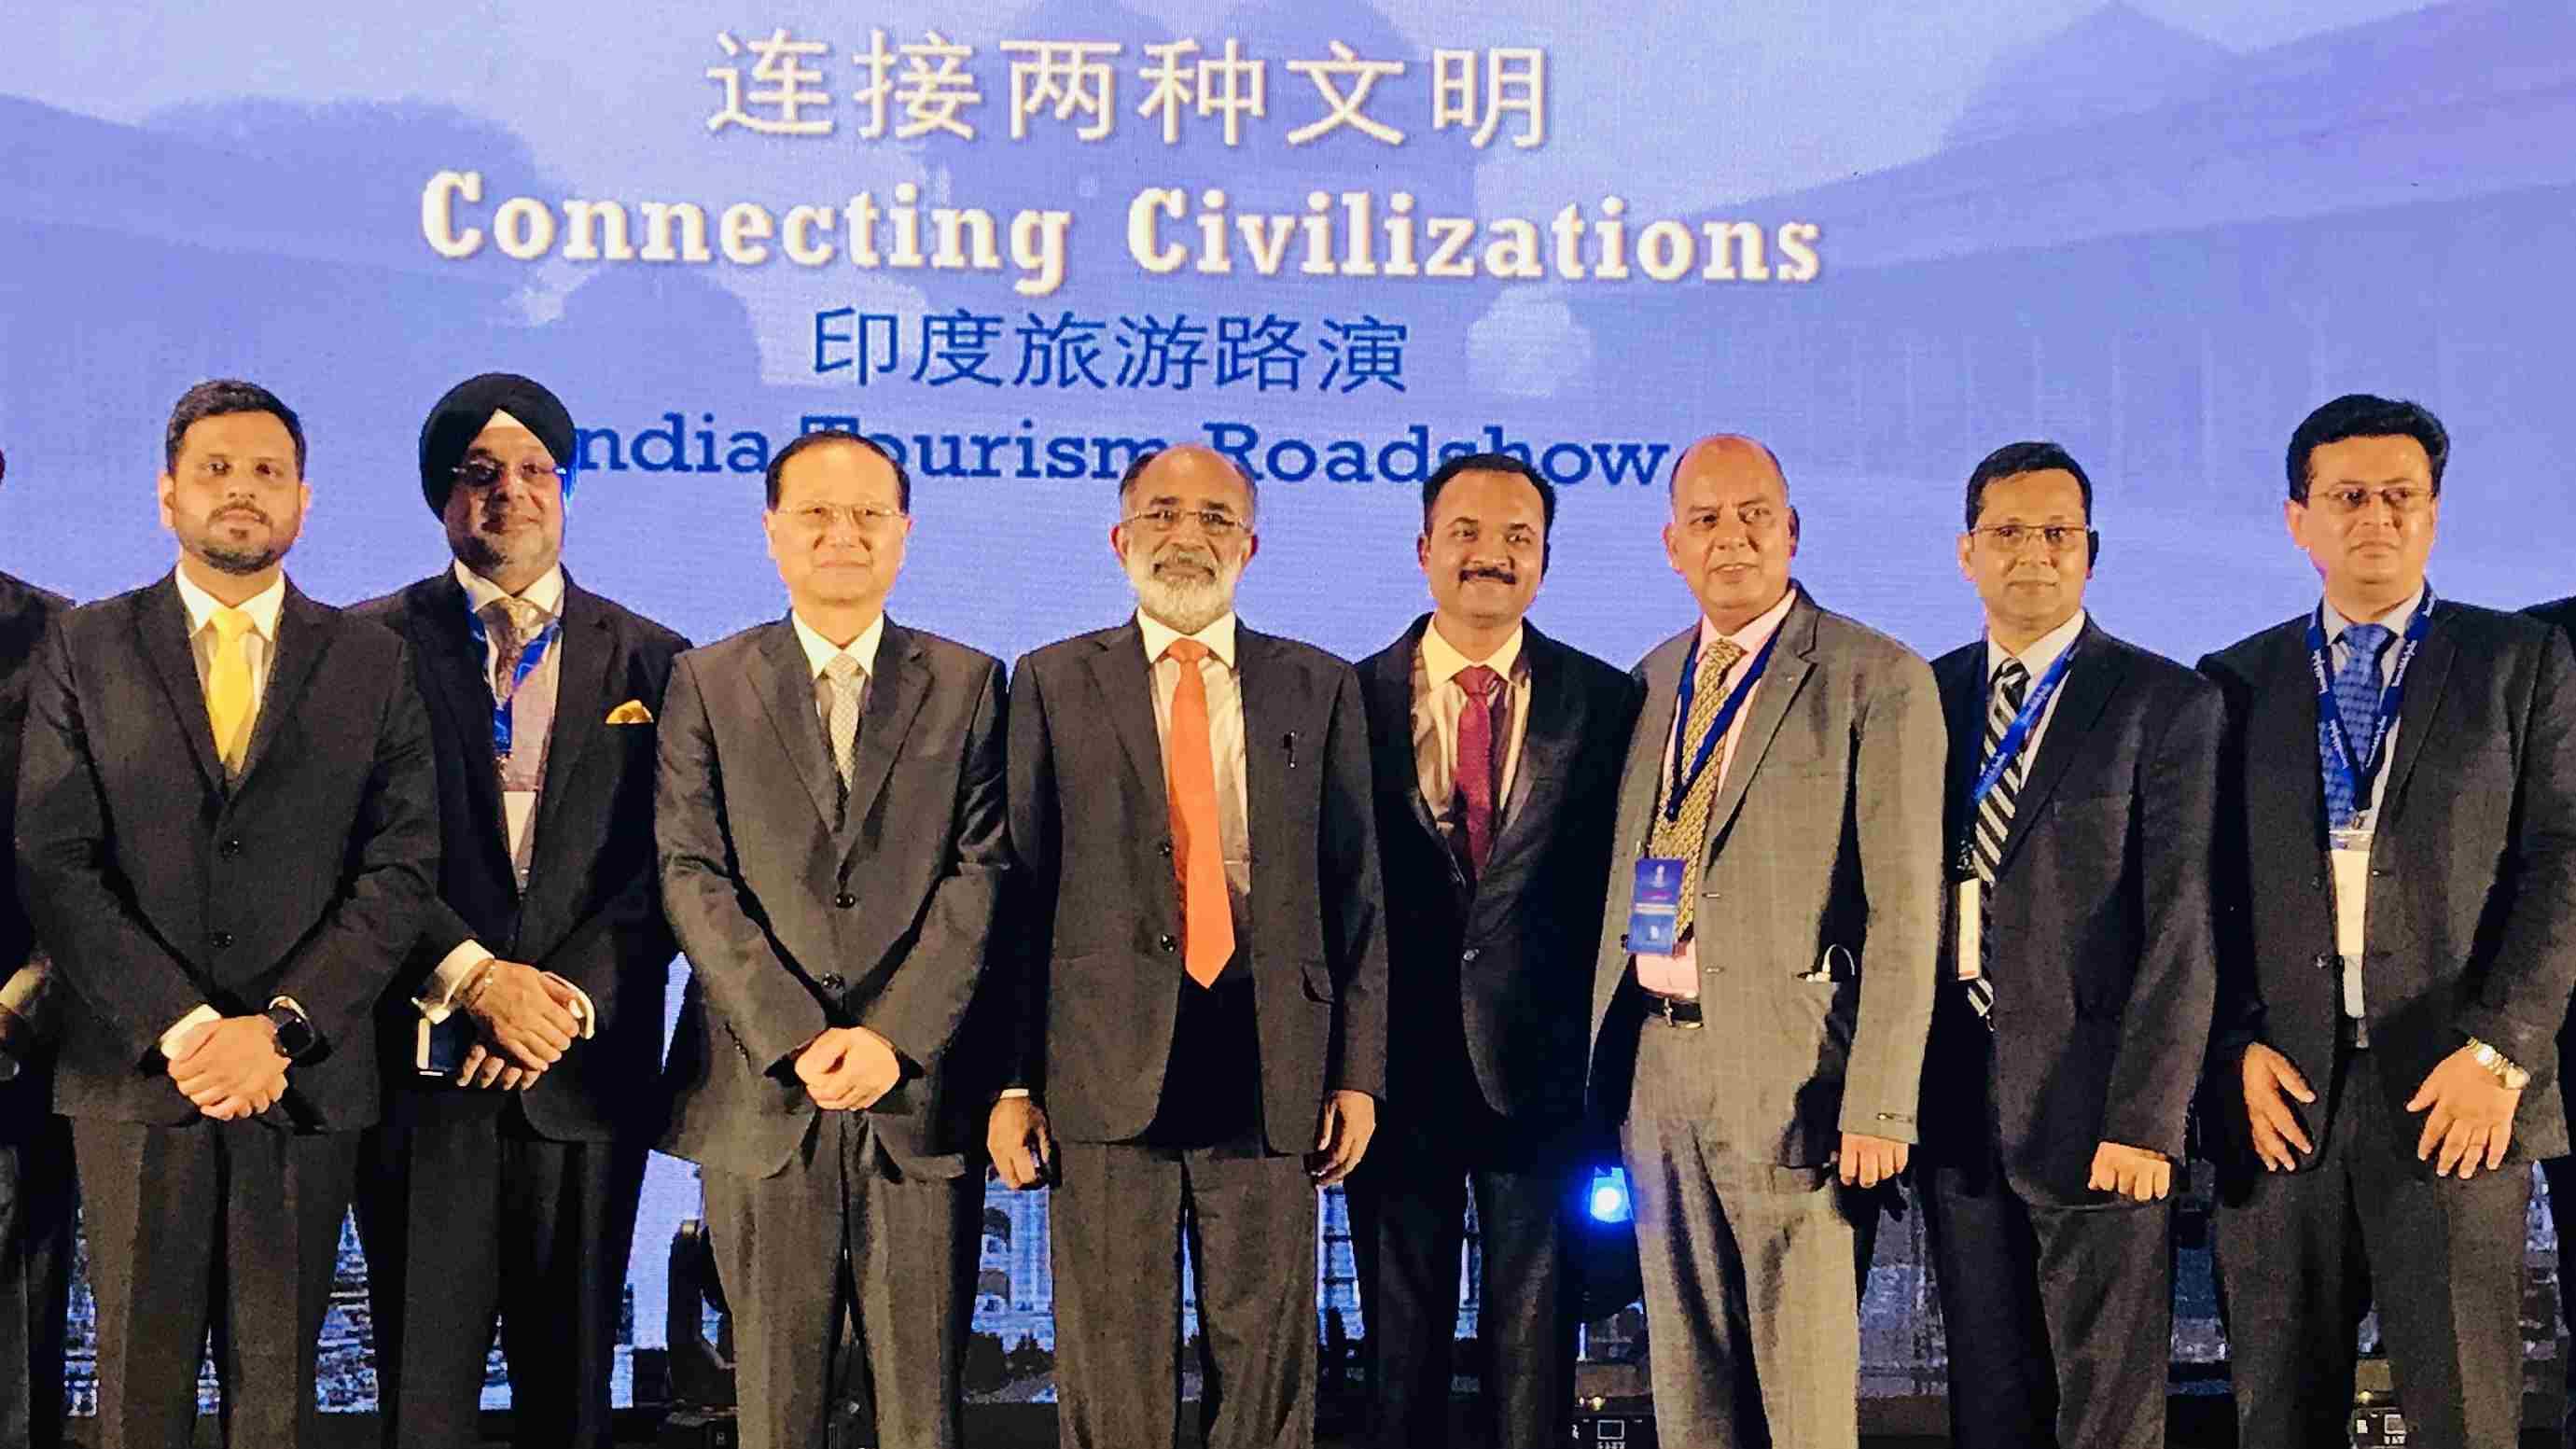 India eyes 14 million Chinese travelers by 2023